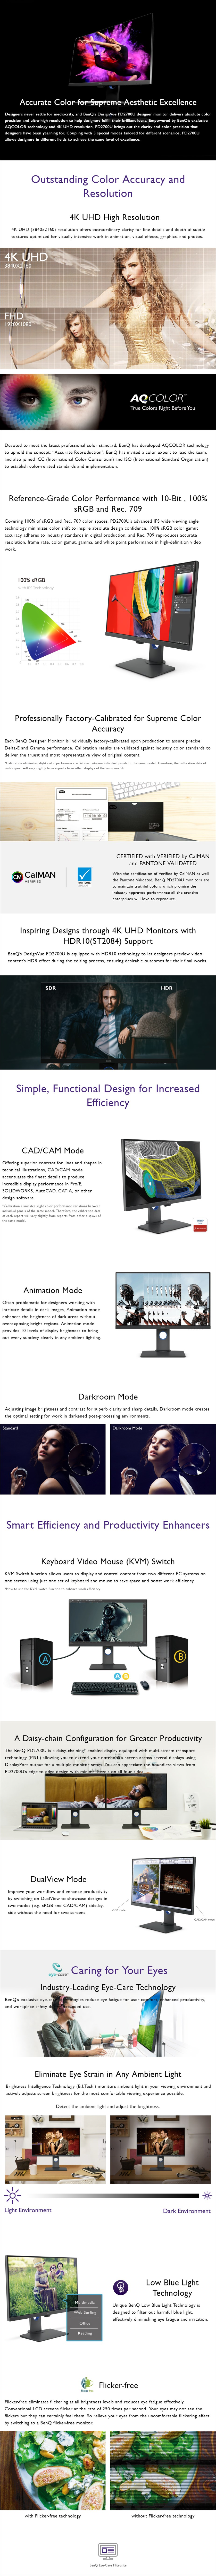 benq-pd2700u-27-4k-uhd-100-srgb-hdr10-calibrated-ips-designer-monitor-ac26551-10.jpg